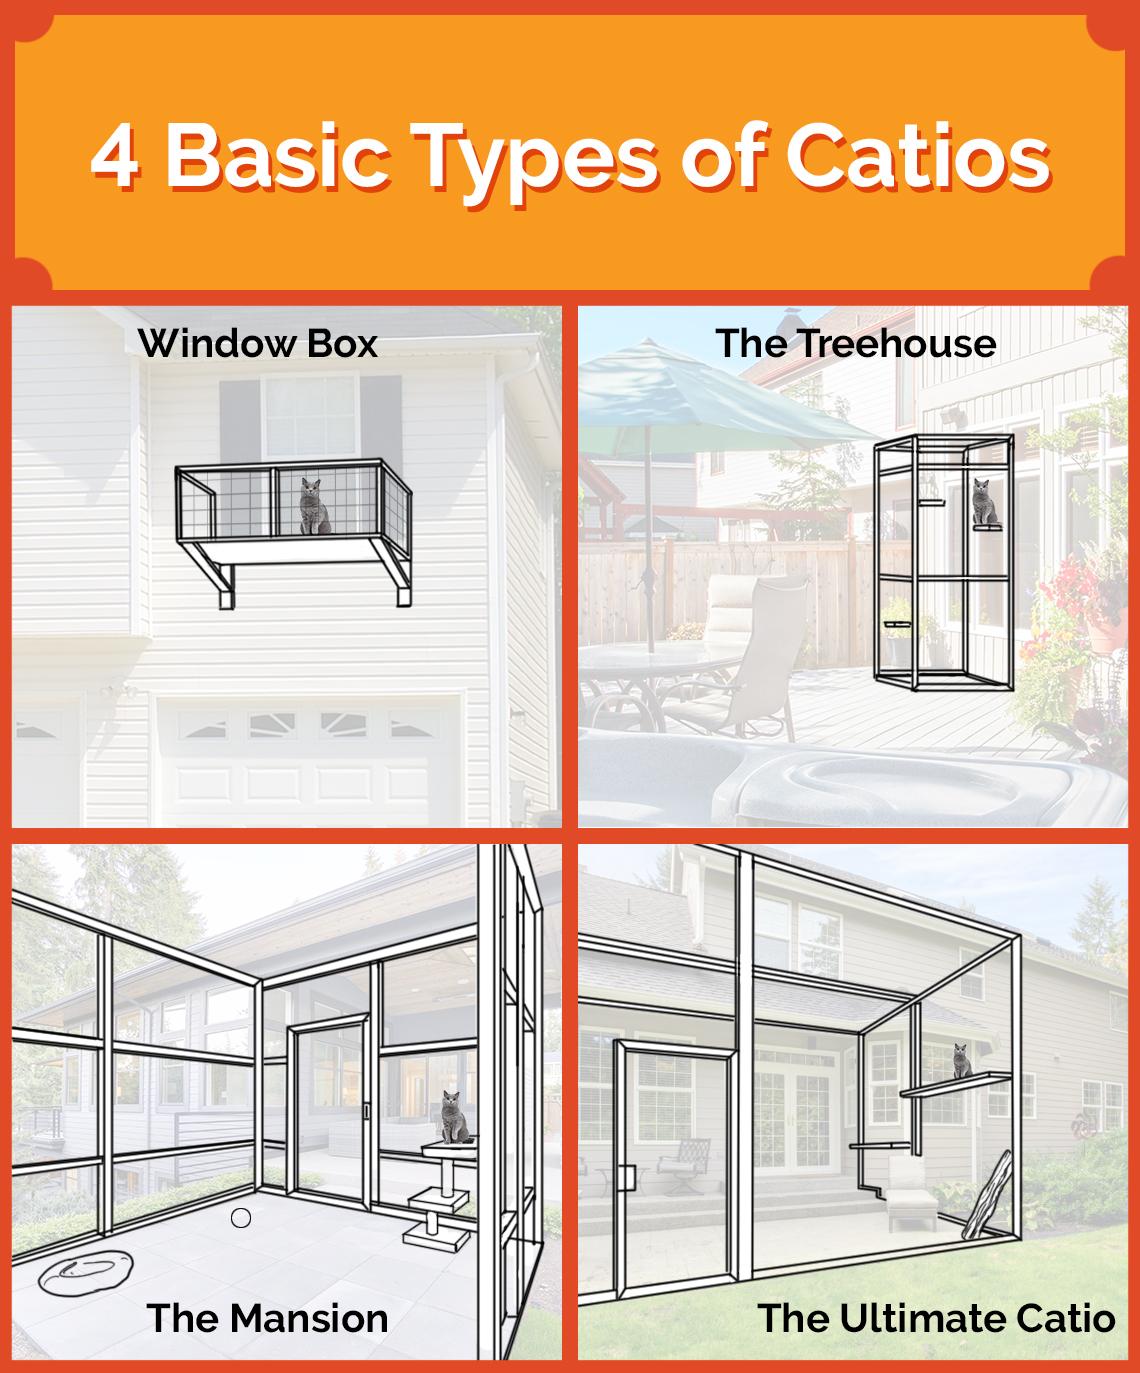 4-basic-types-of-catios.jpg